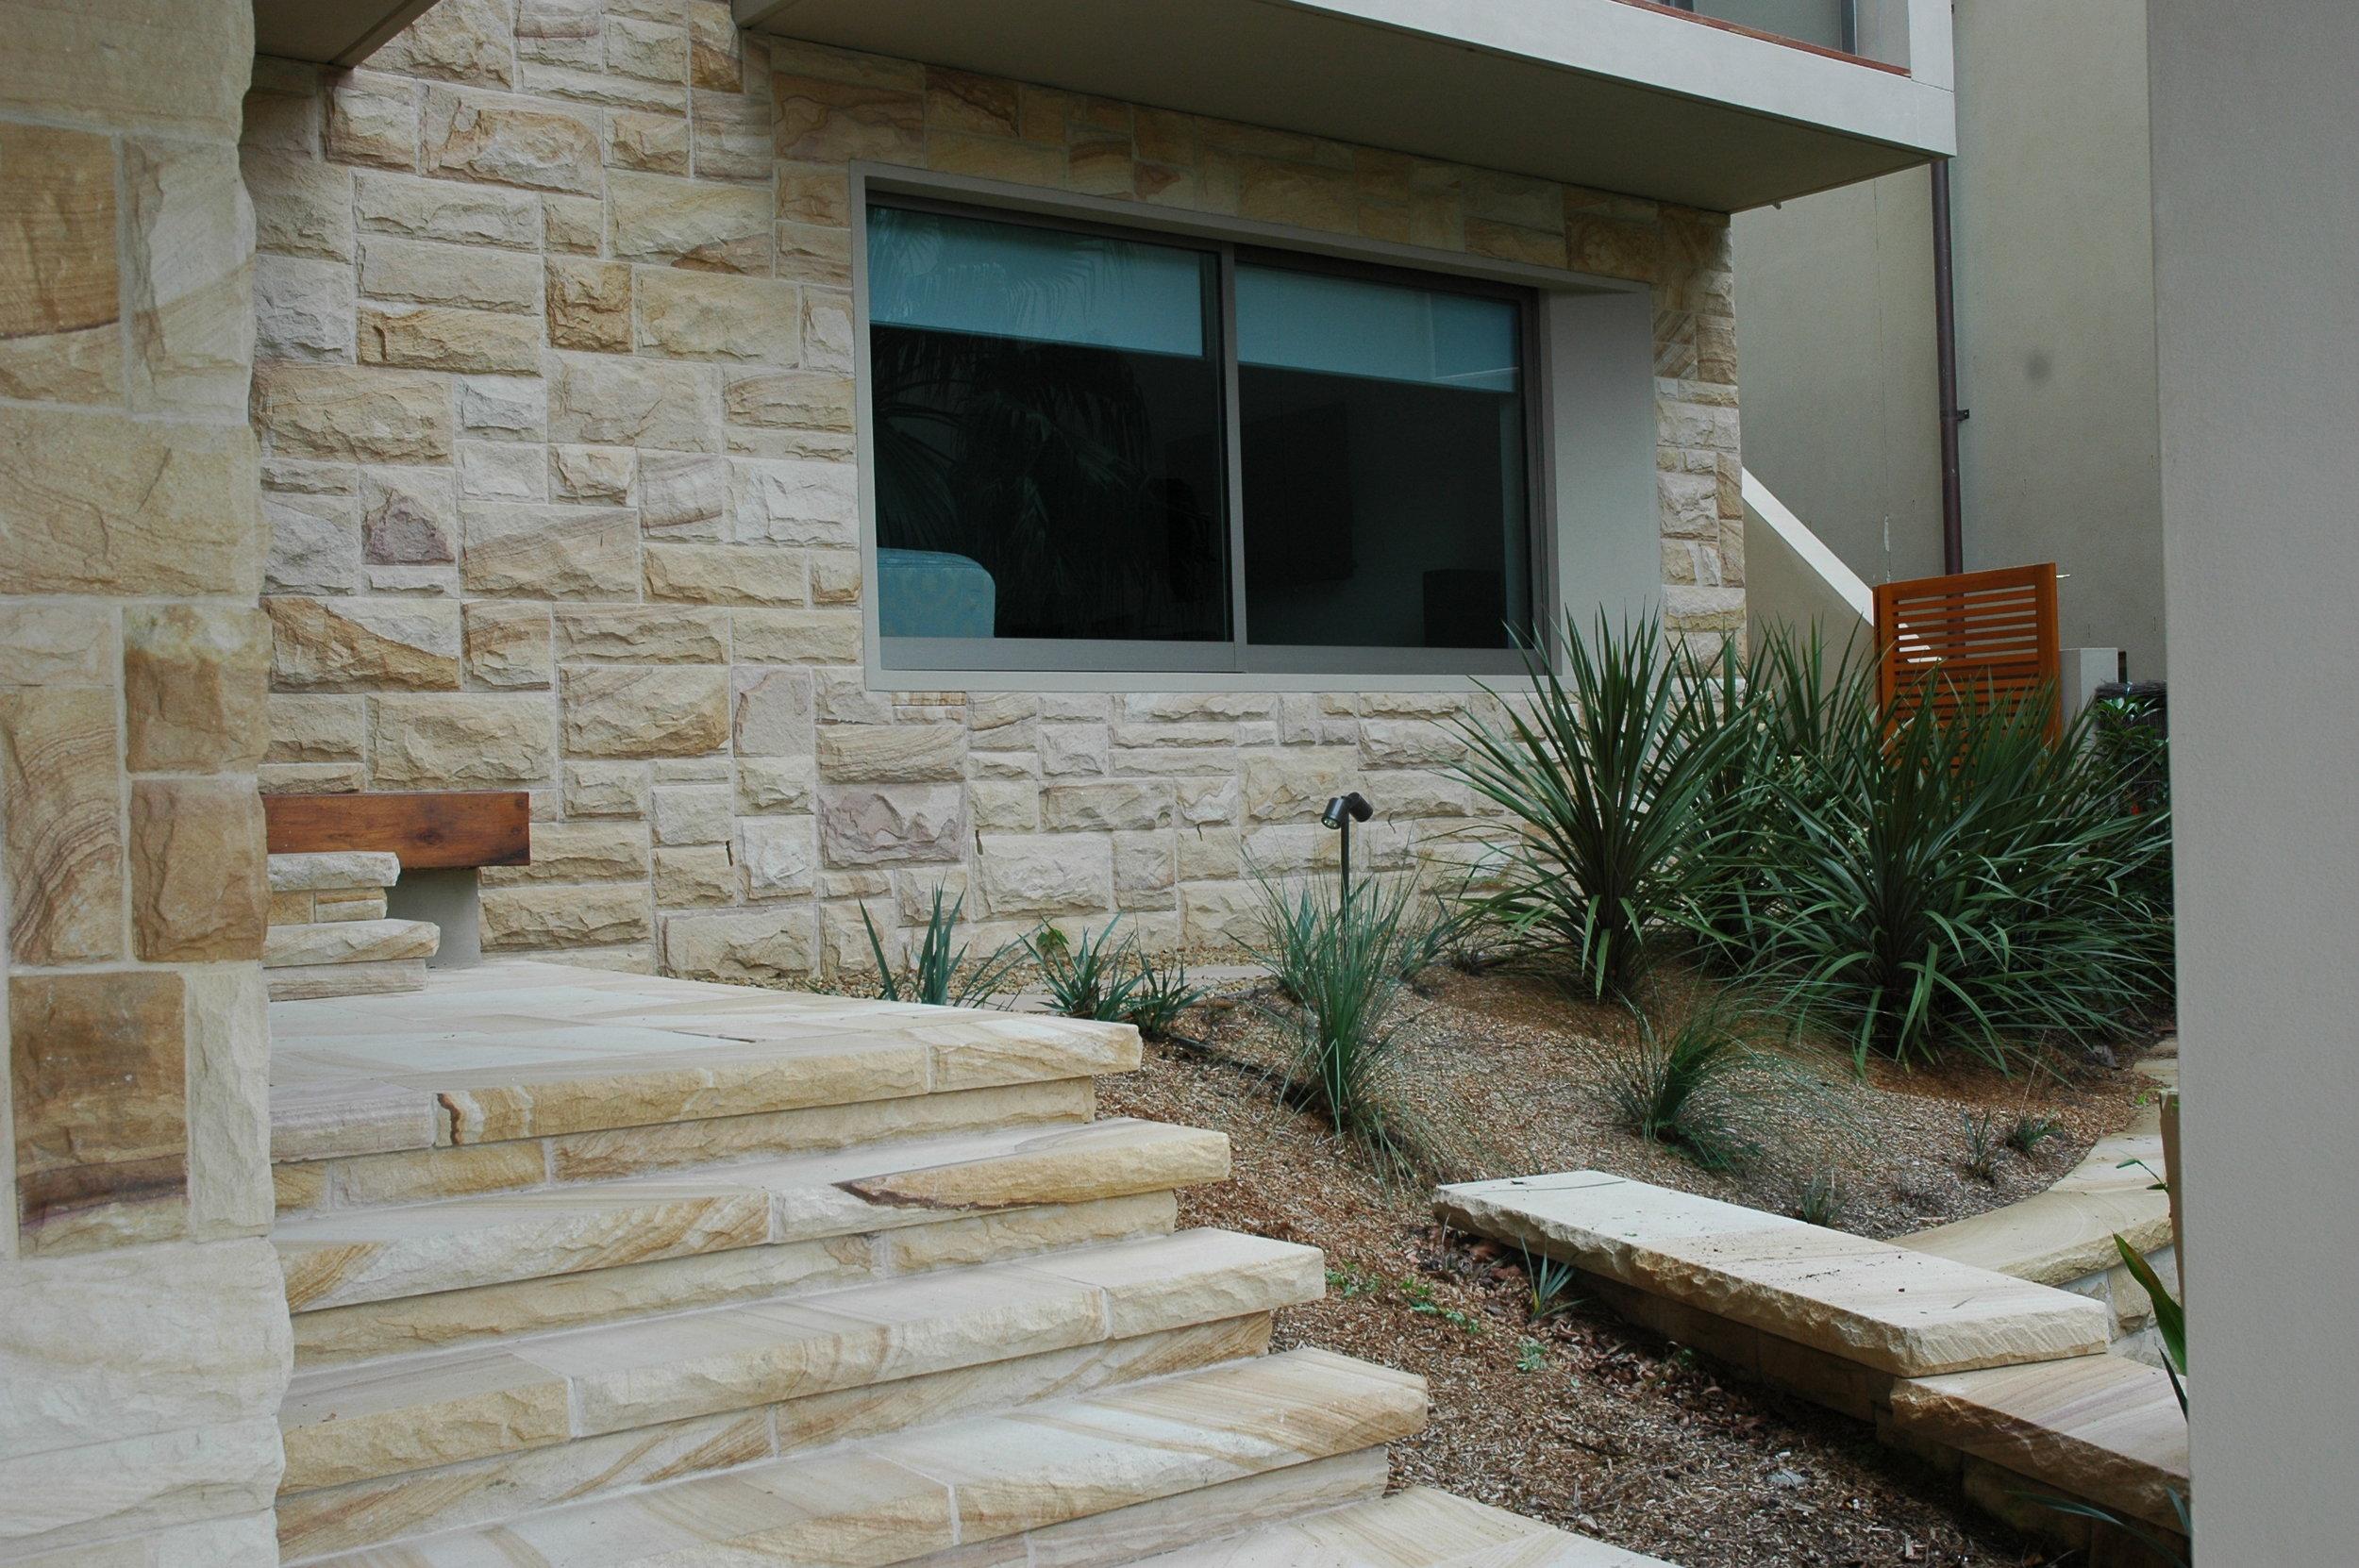 Medium brown random square rockfaced cladding and step detail - Artistry in stone (3).JPG